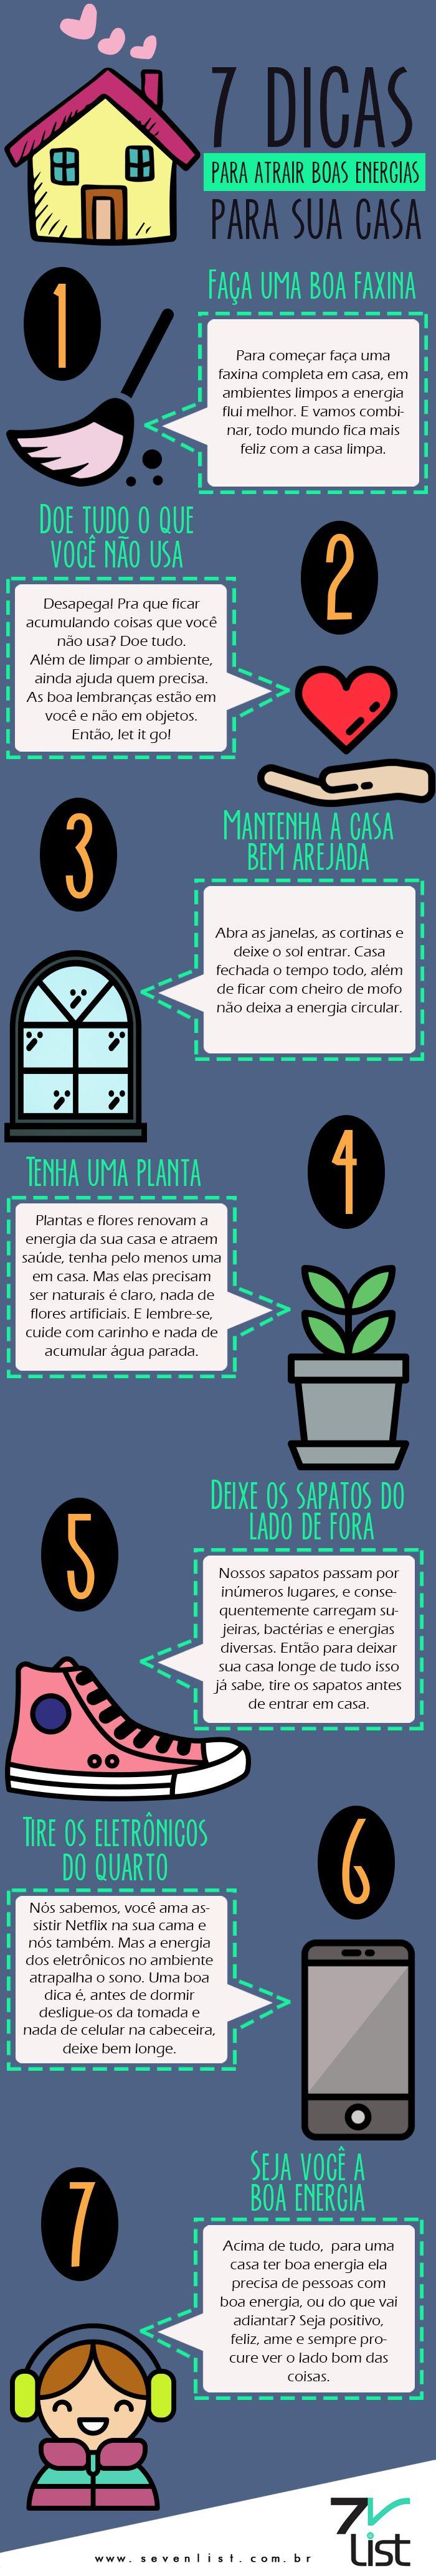 #Infográfico #Casa #Dicas #BemEstar #Paz #Saúde #Cuidados #Lifestyle #Goodvibes…